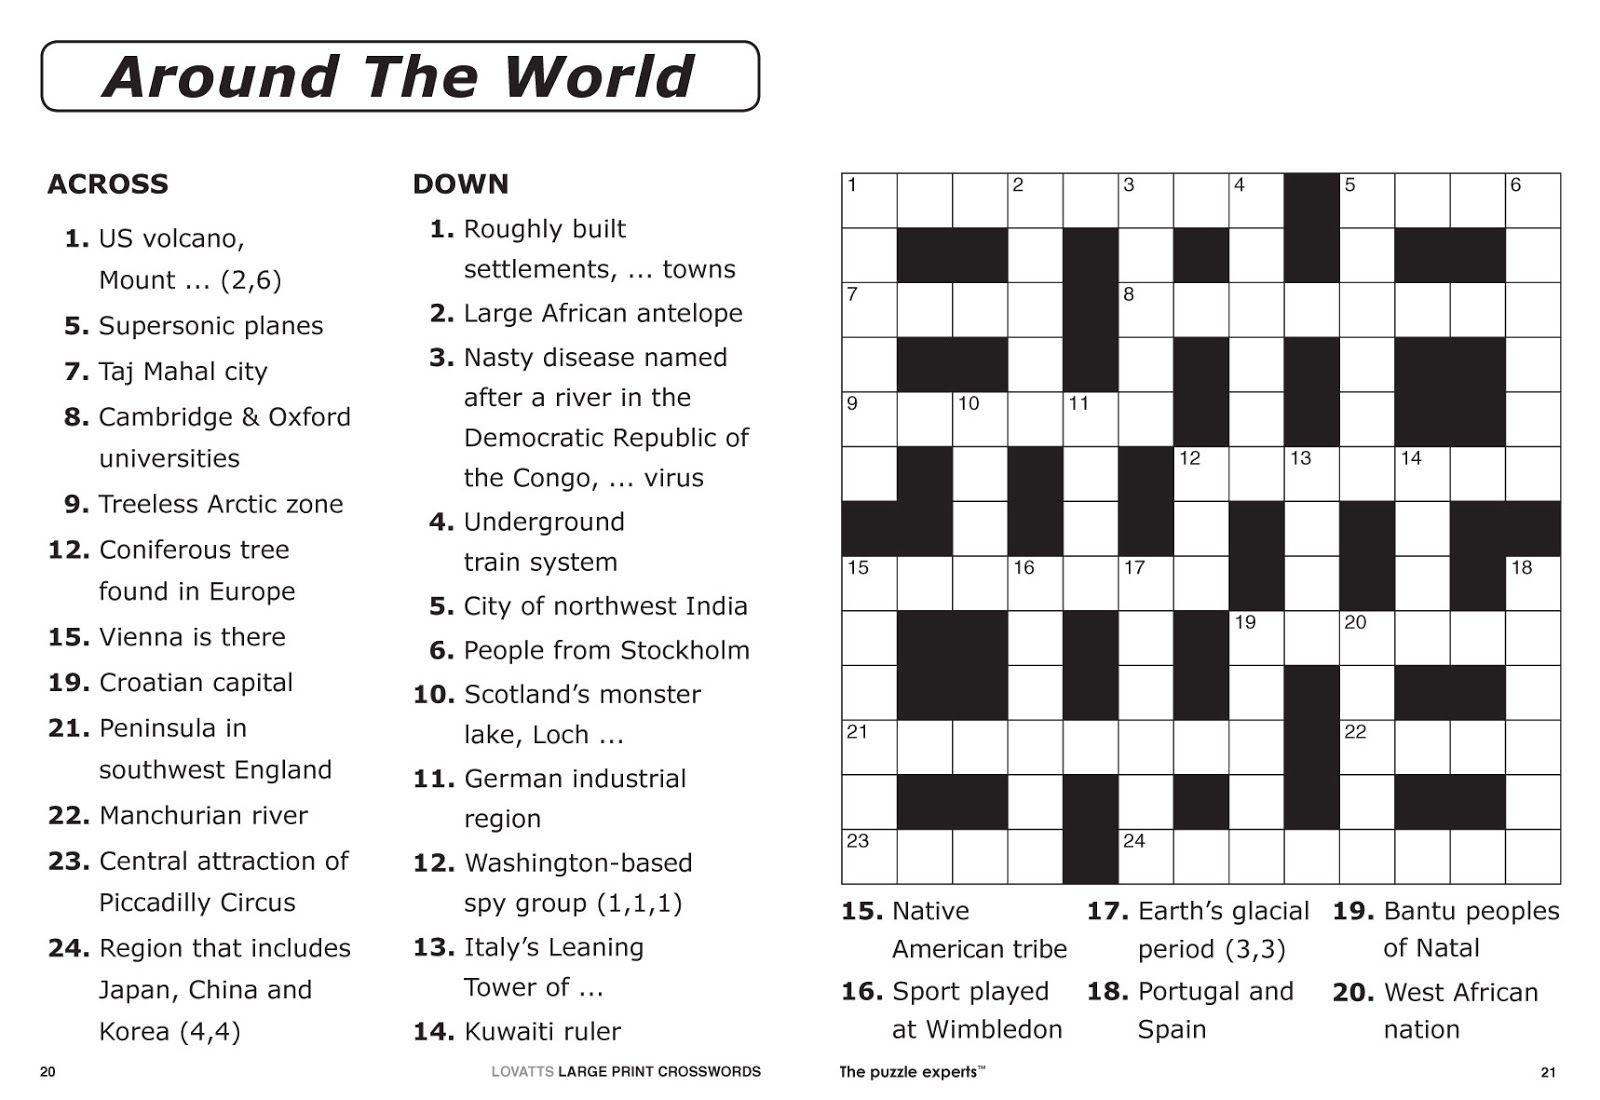 Free Printable Large Print Crossword Puzzles | M3U8 - Free Printable Crosswords